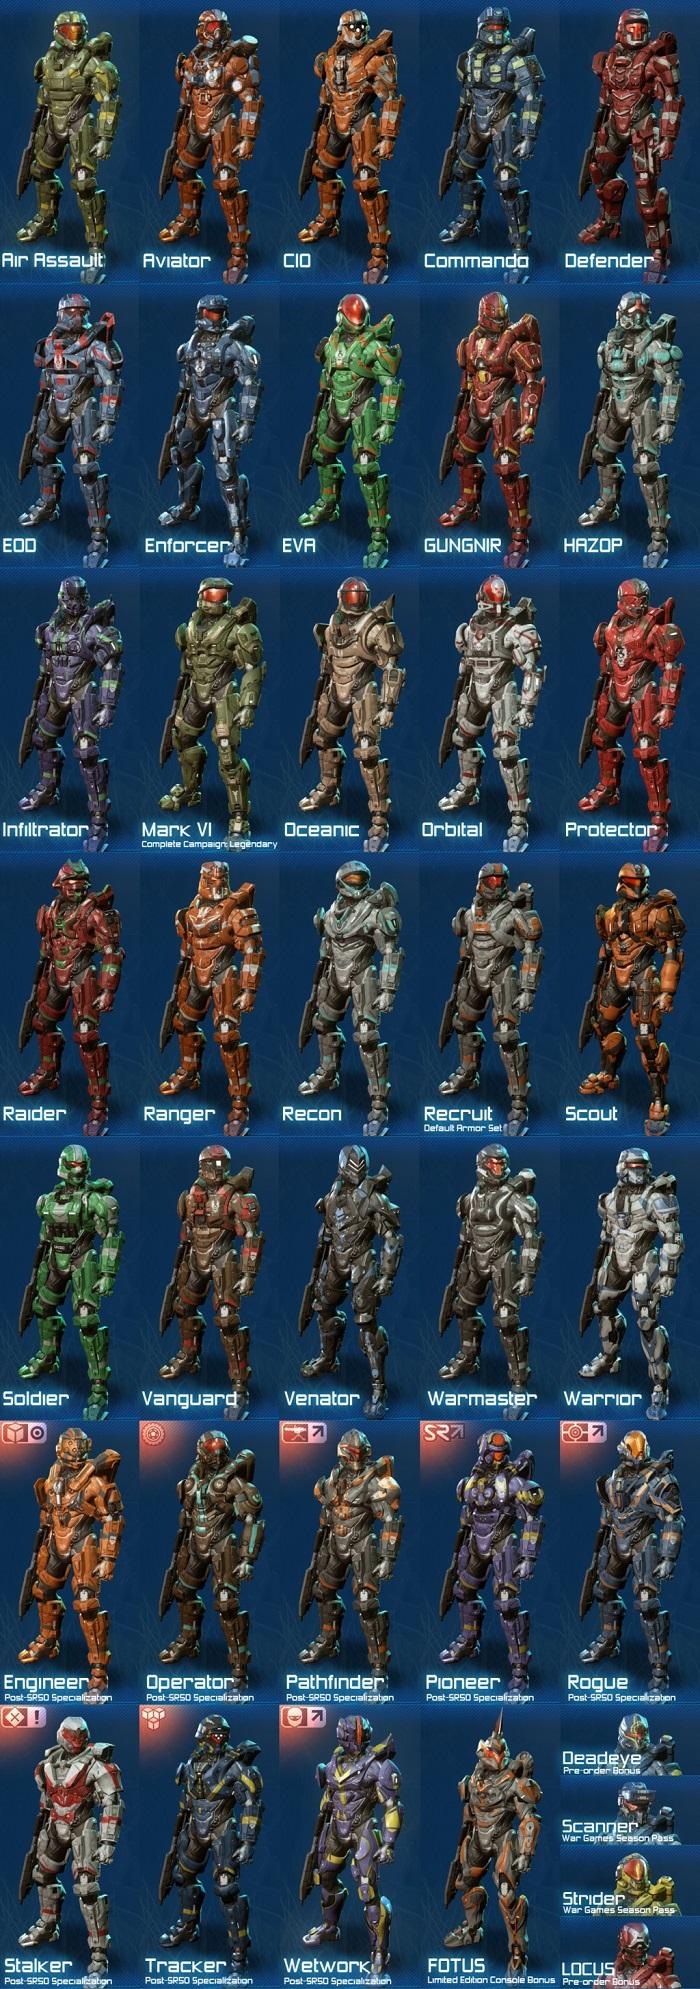 Halo 4 Mega Guide: Tips, Secrets, Armor Unlocks, and more